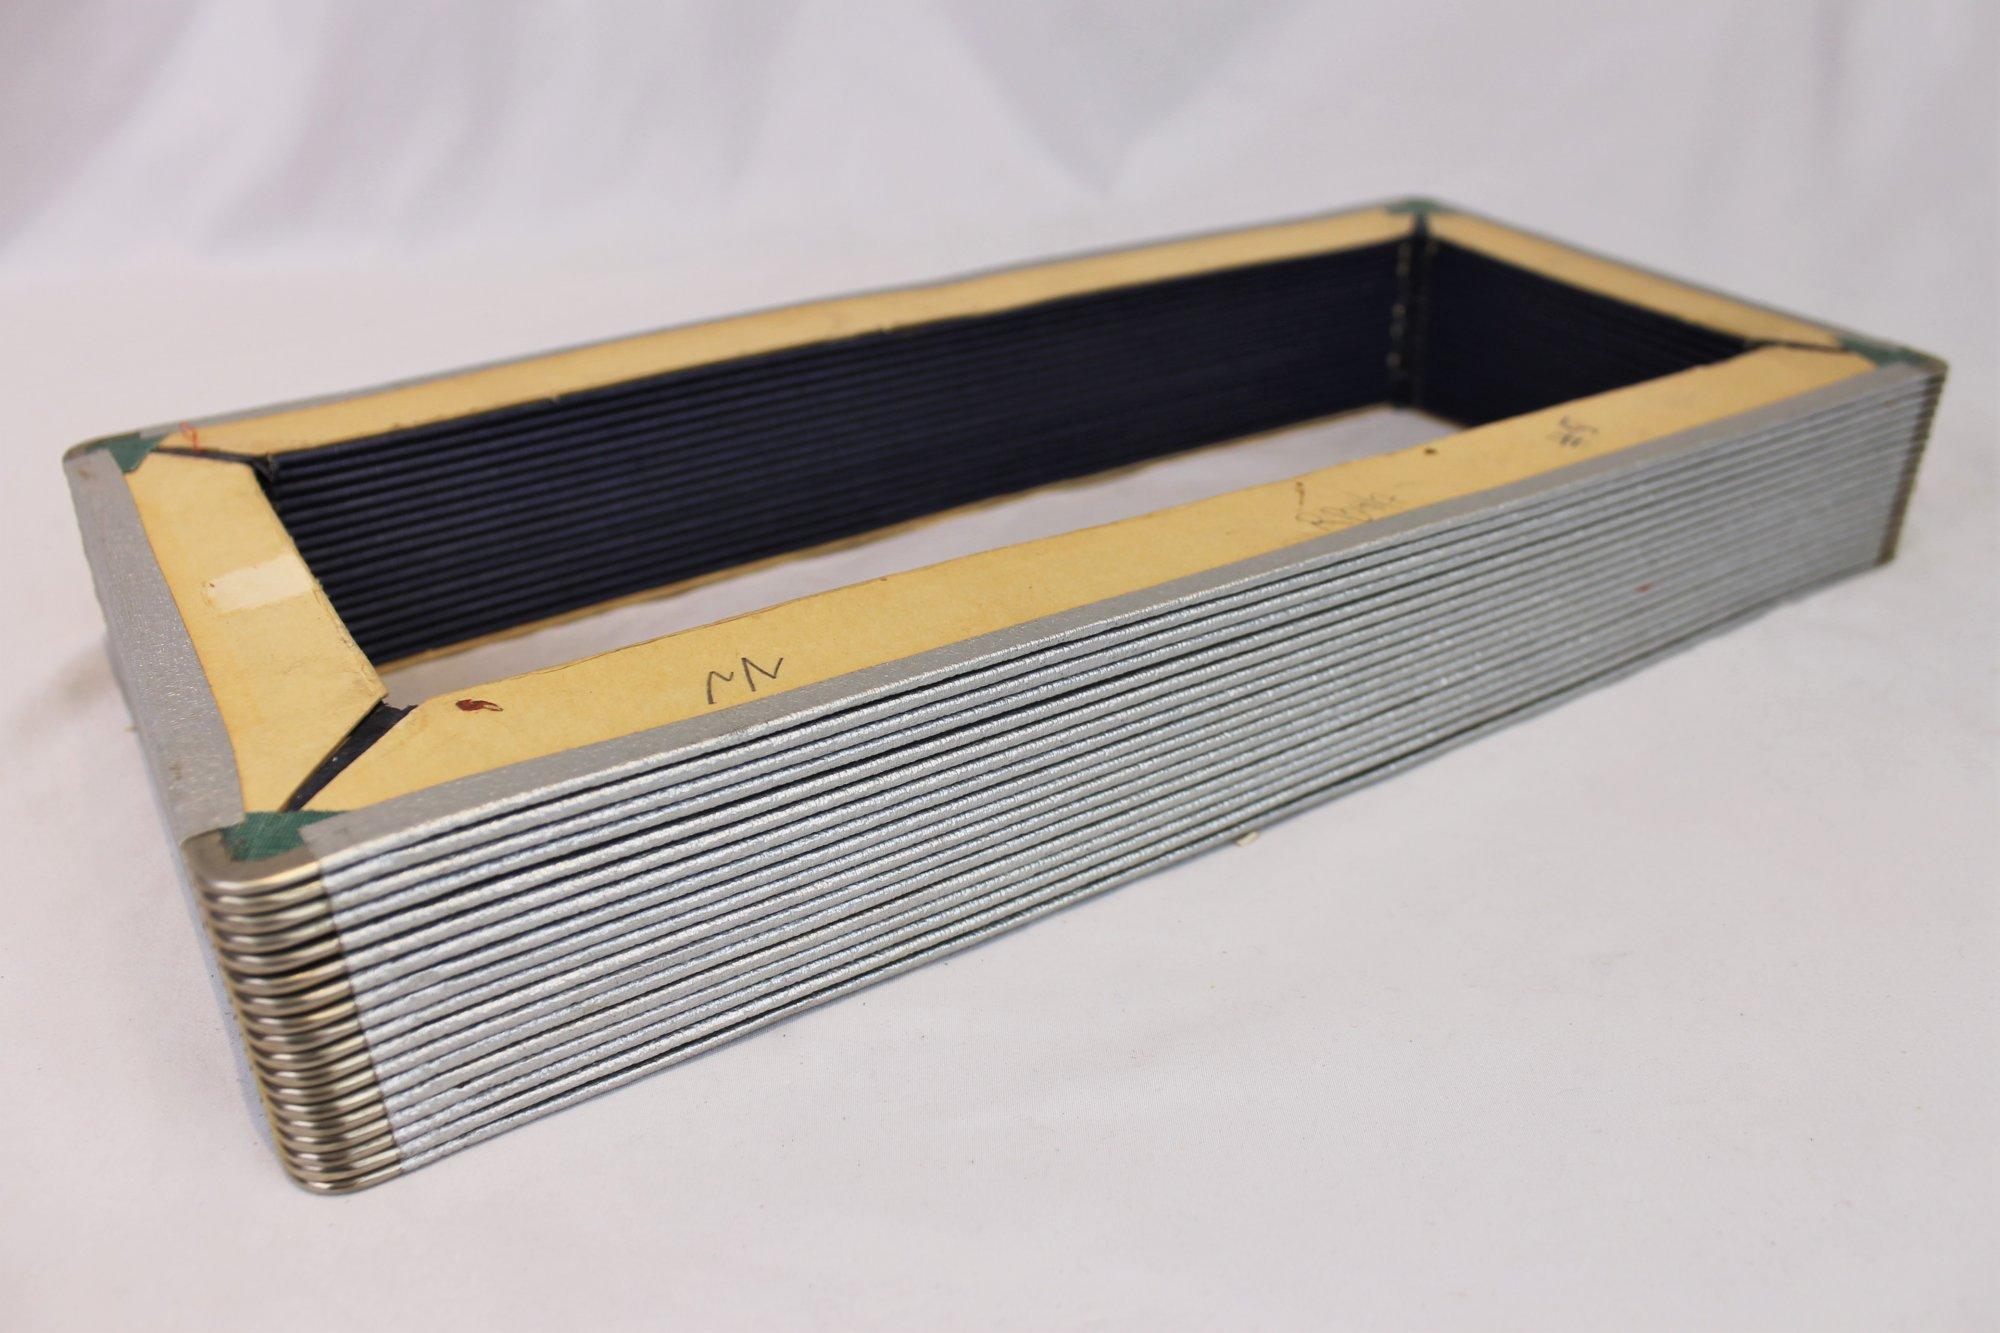 Accordion Part - Bellows 16.33 x 7.66 x 2.25 18 Folds